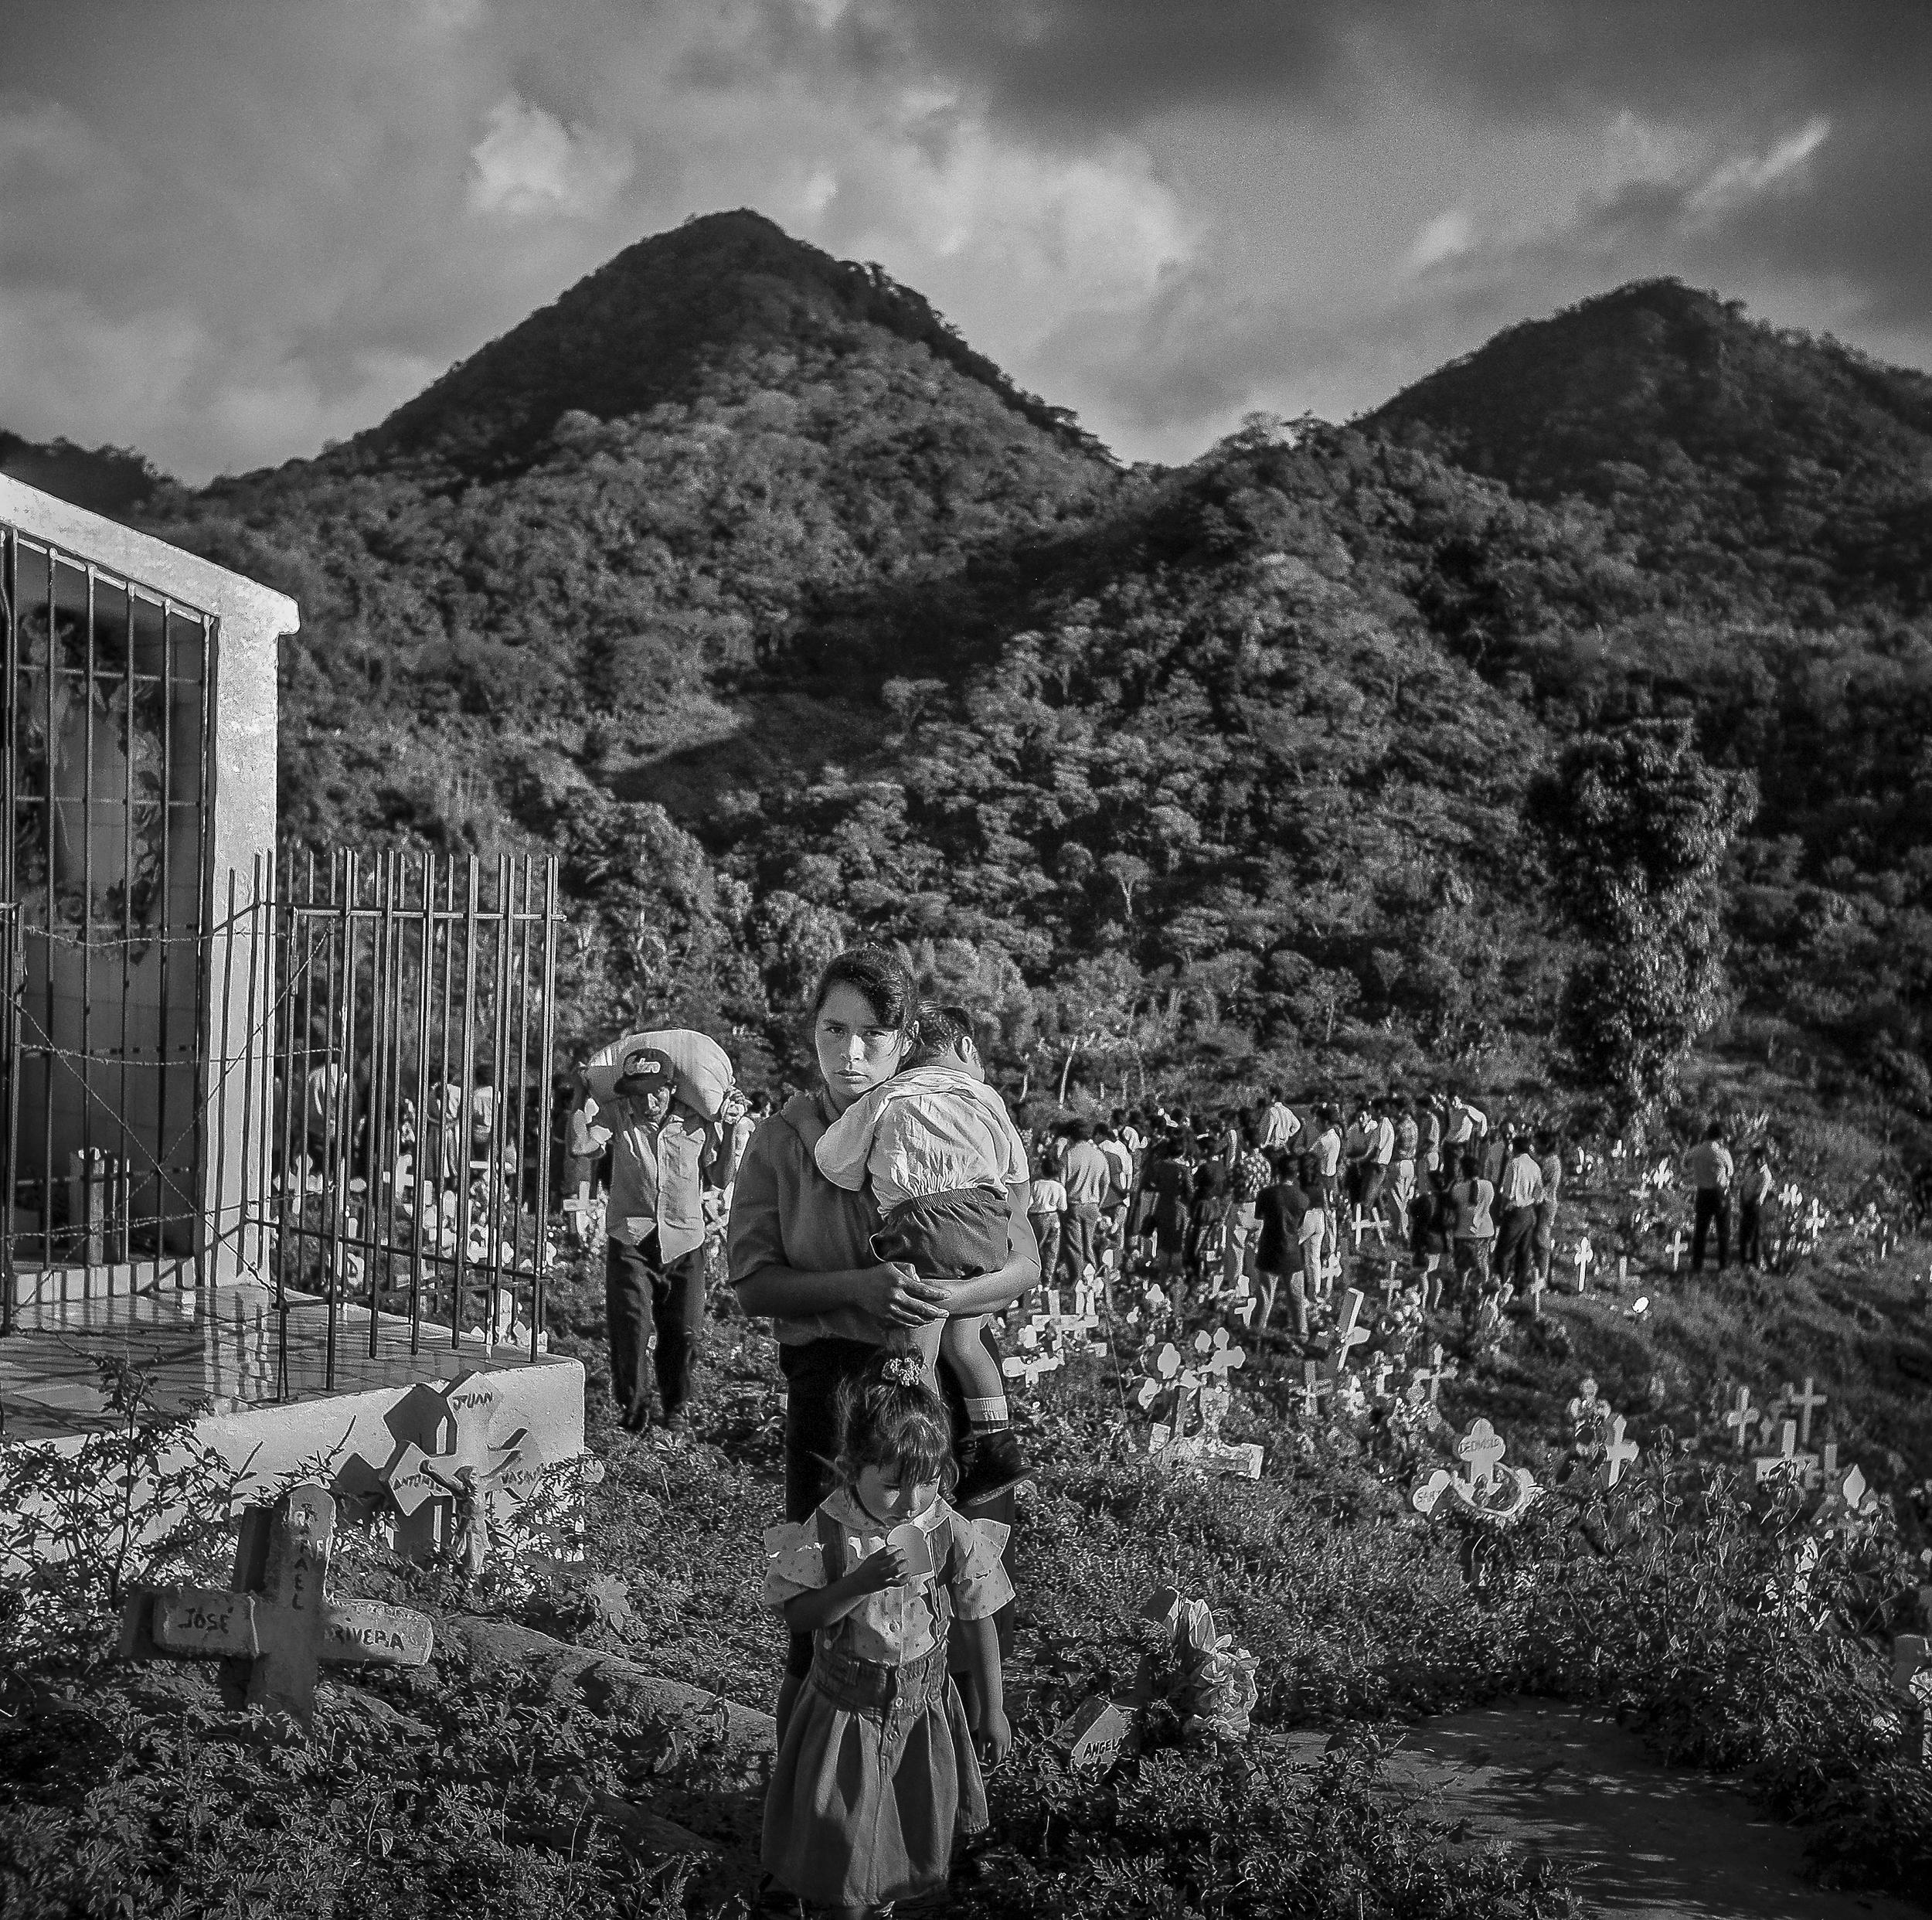 Funeral for her dad in Panchimalco, El Salvador